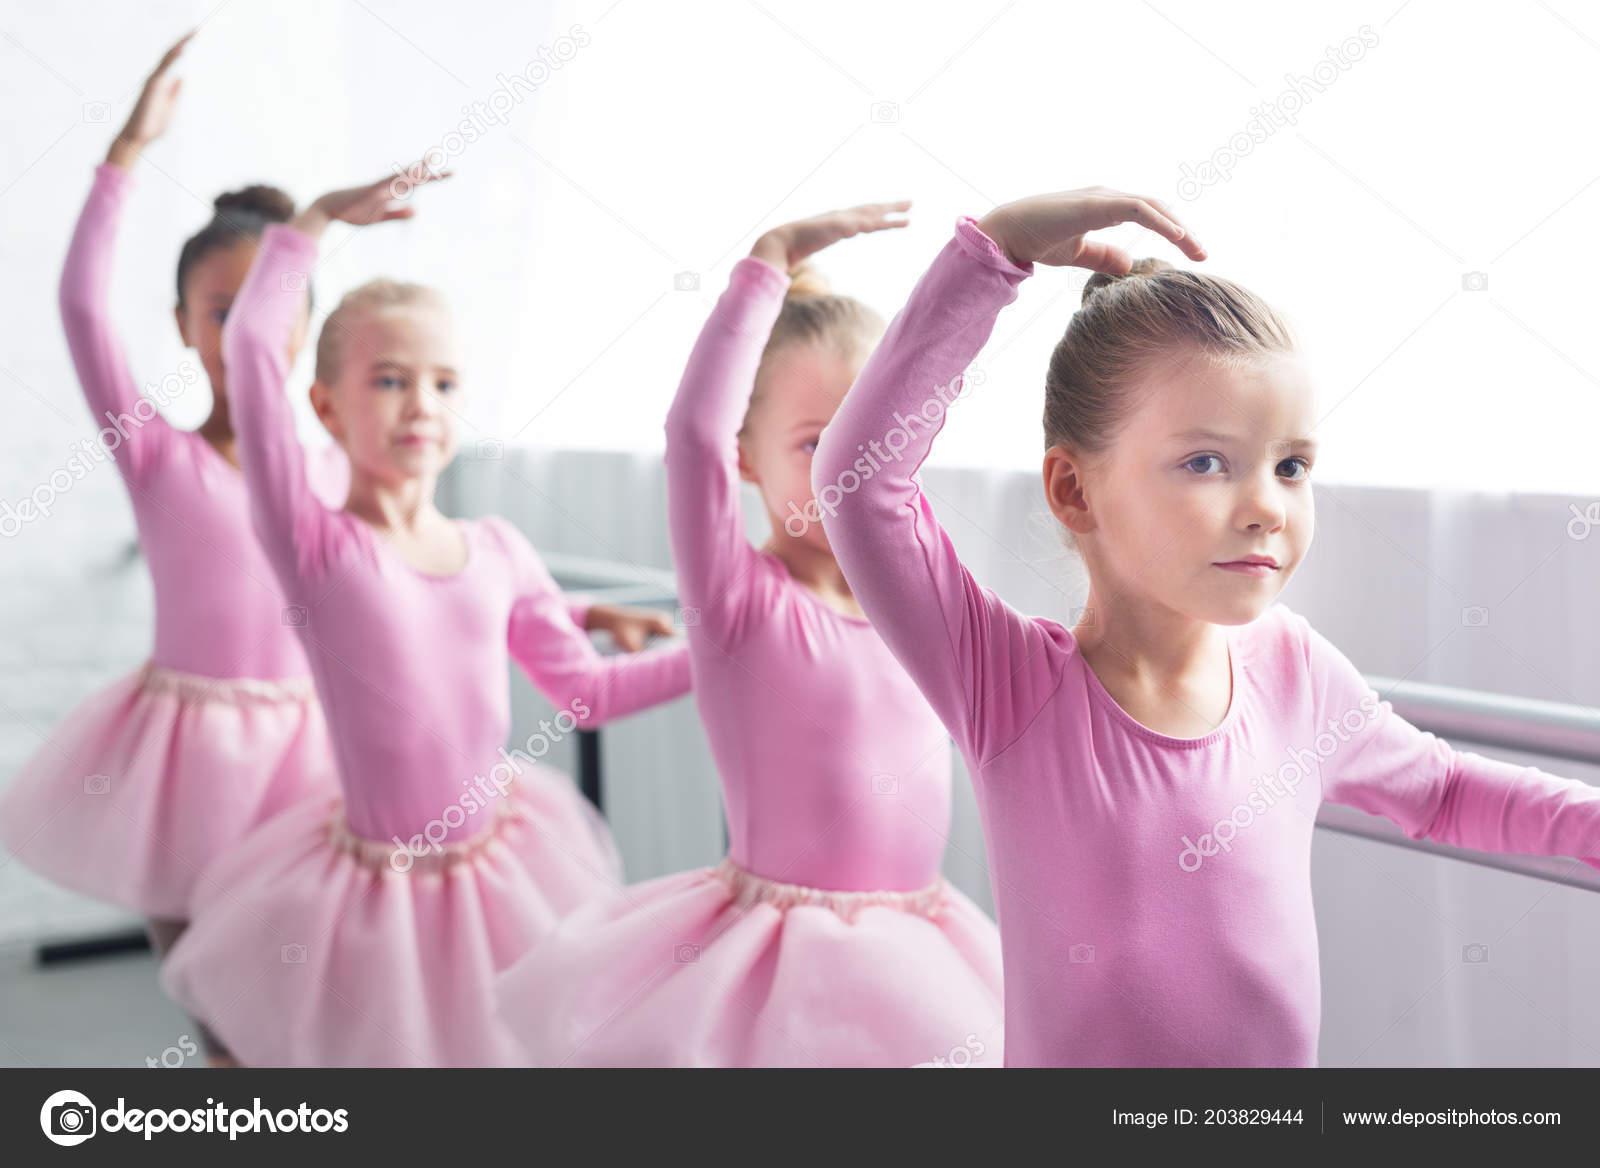 bf1a3e7d7ab Όμορφα Παιδιά Ροζ Τουτού Φούστες Χορού Στη Σχολή Μπαλέτου — Φωτογραφία  Αρχείου